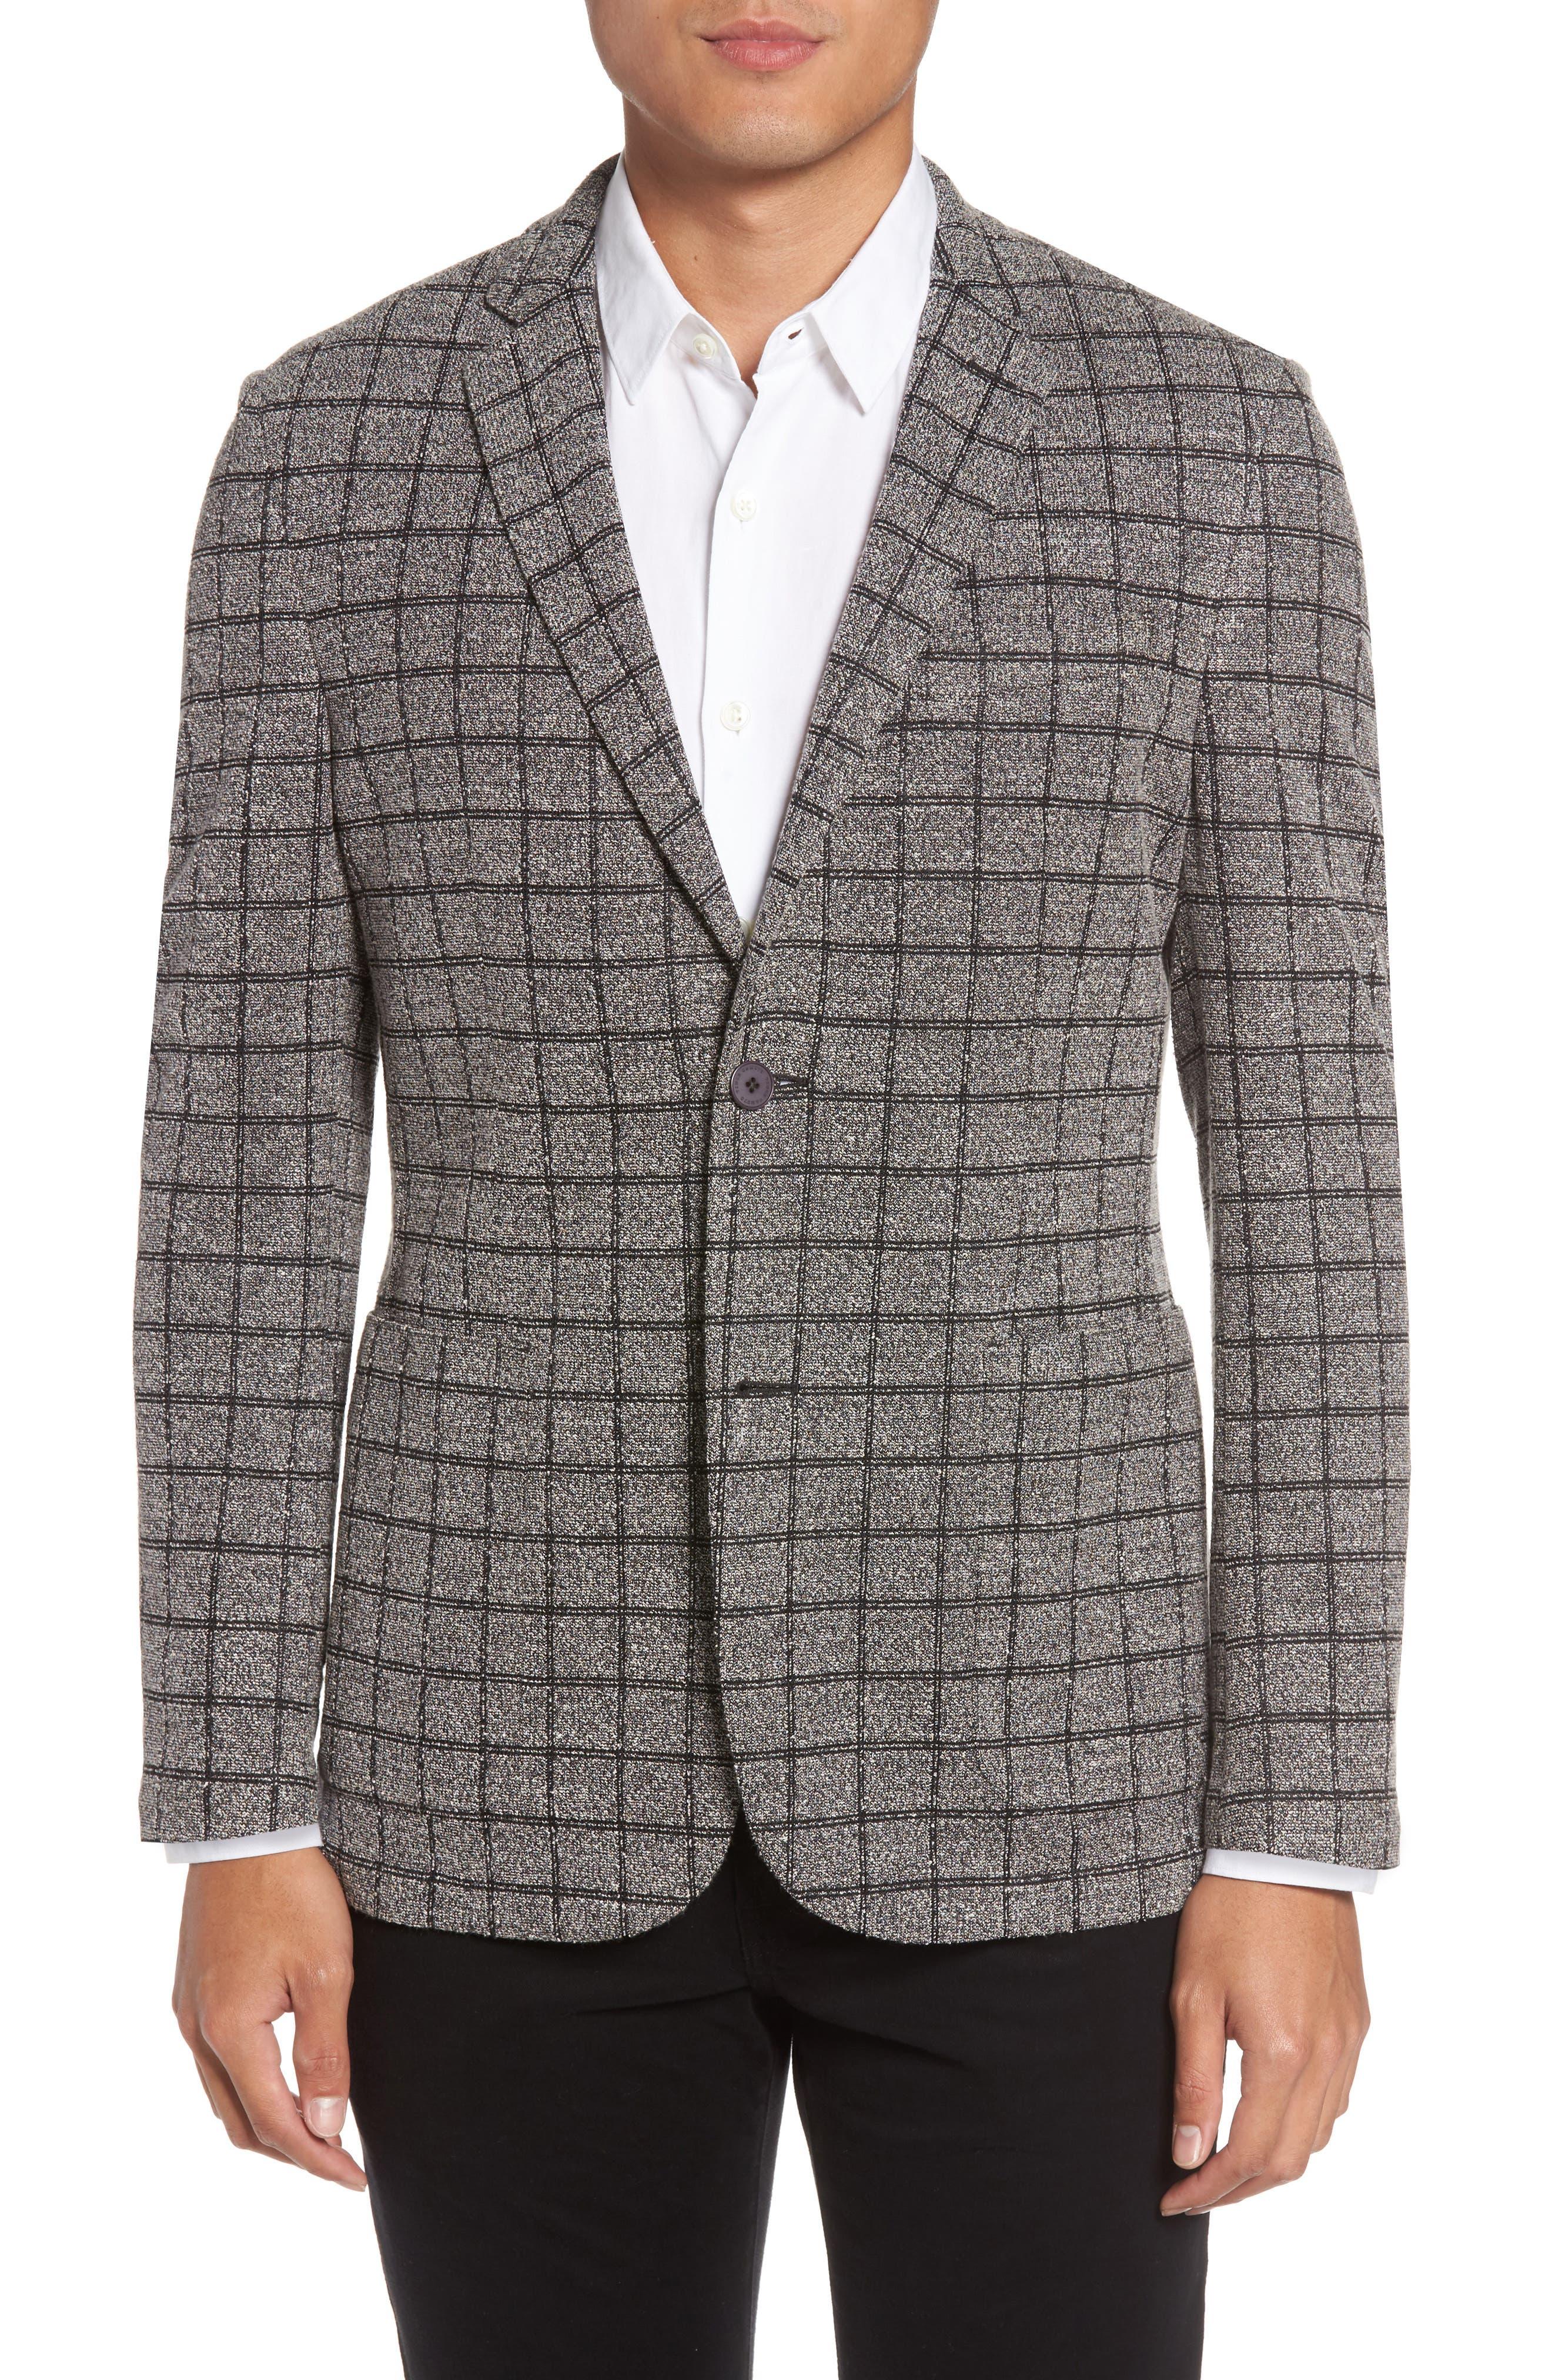 Del Aria Slim Fit Check Knit Jacket,                             Main thumbnail 1, color,                             020